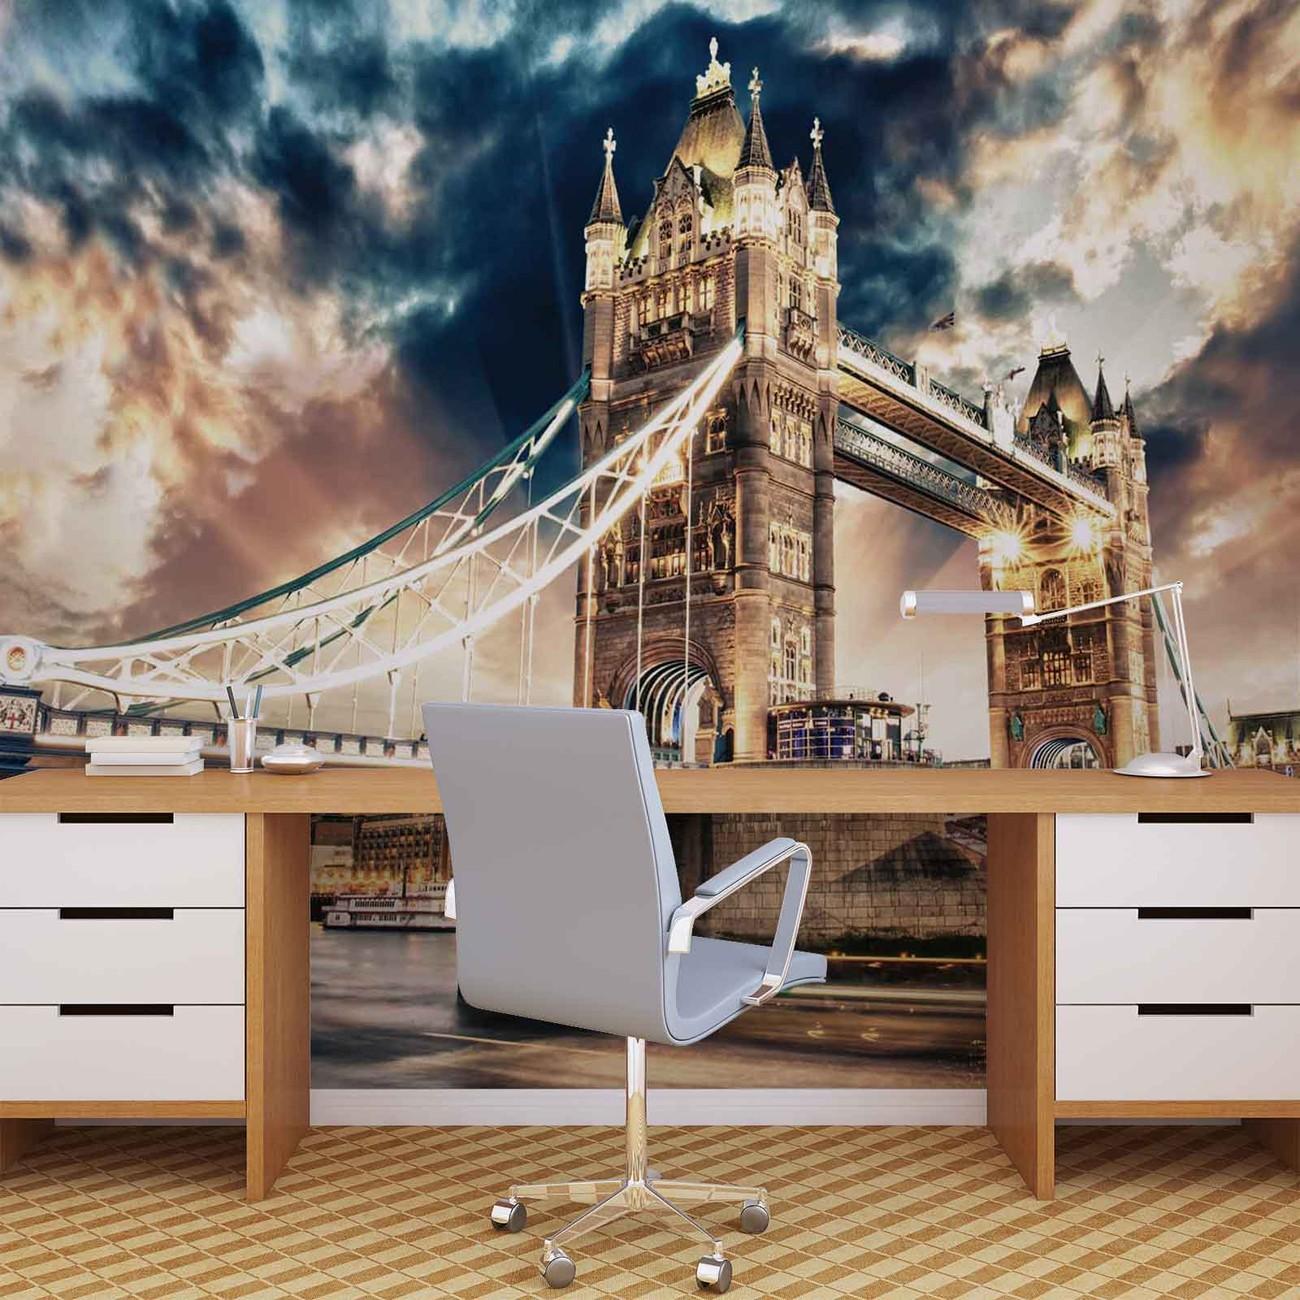 fototapete tapete stadt london tower bridge bei europosters kostenloser versand. Black Bedroom Furniture Sets. Home Design Ideas